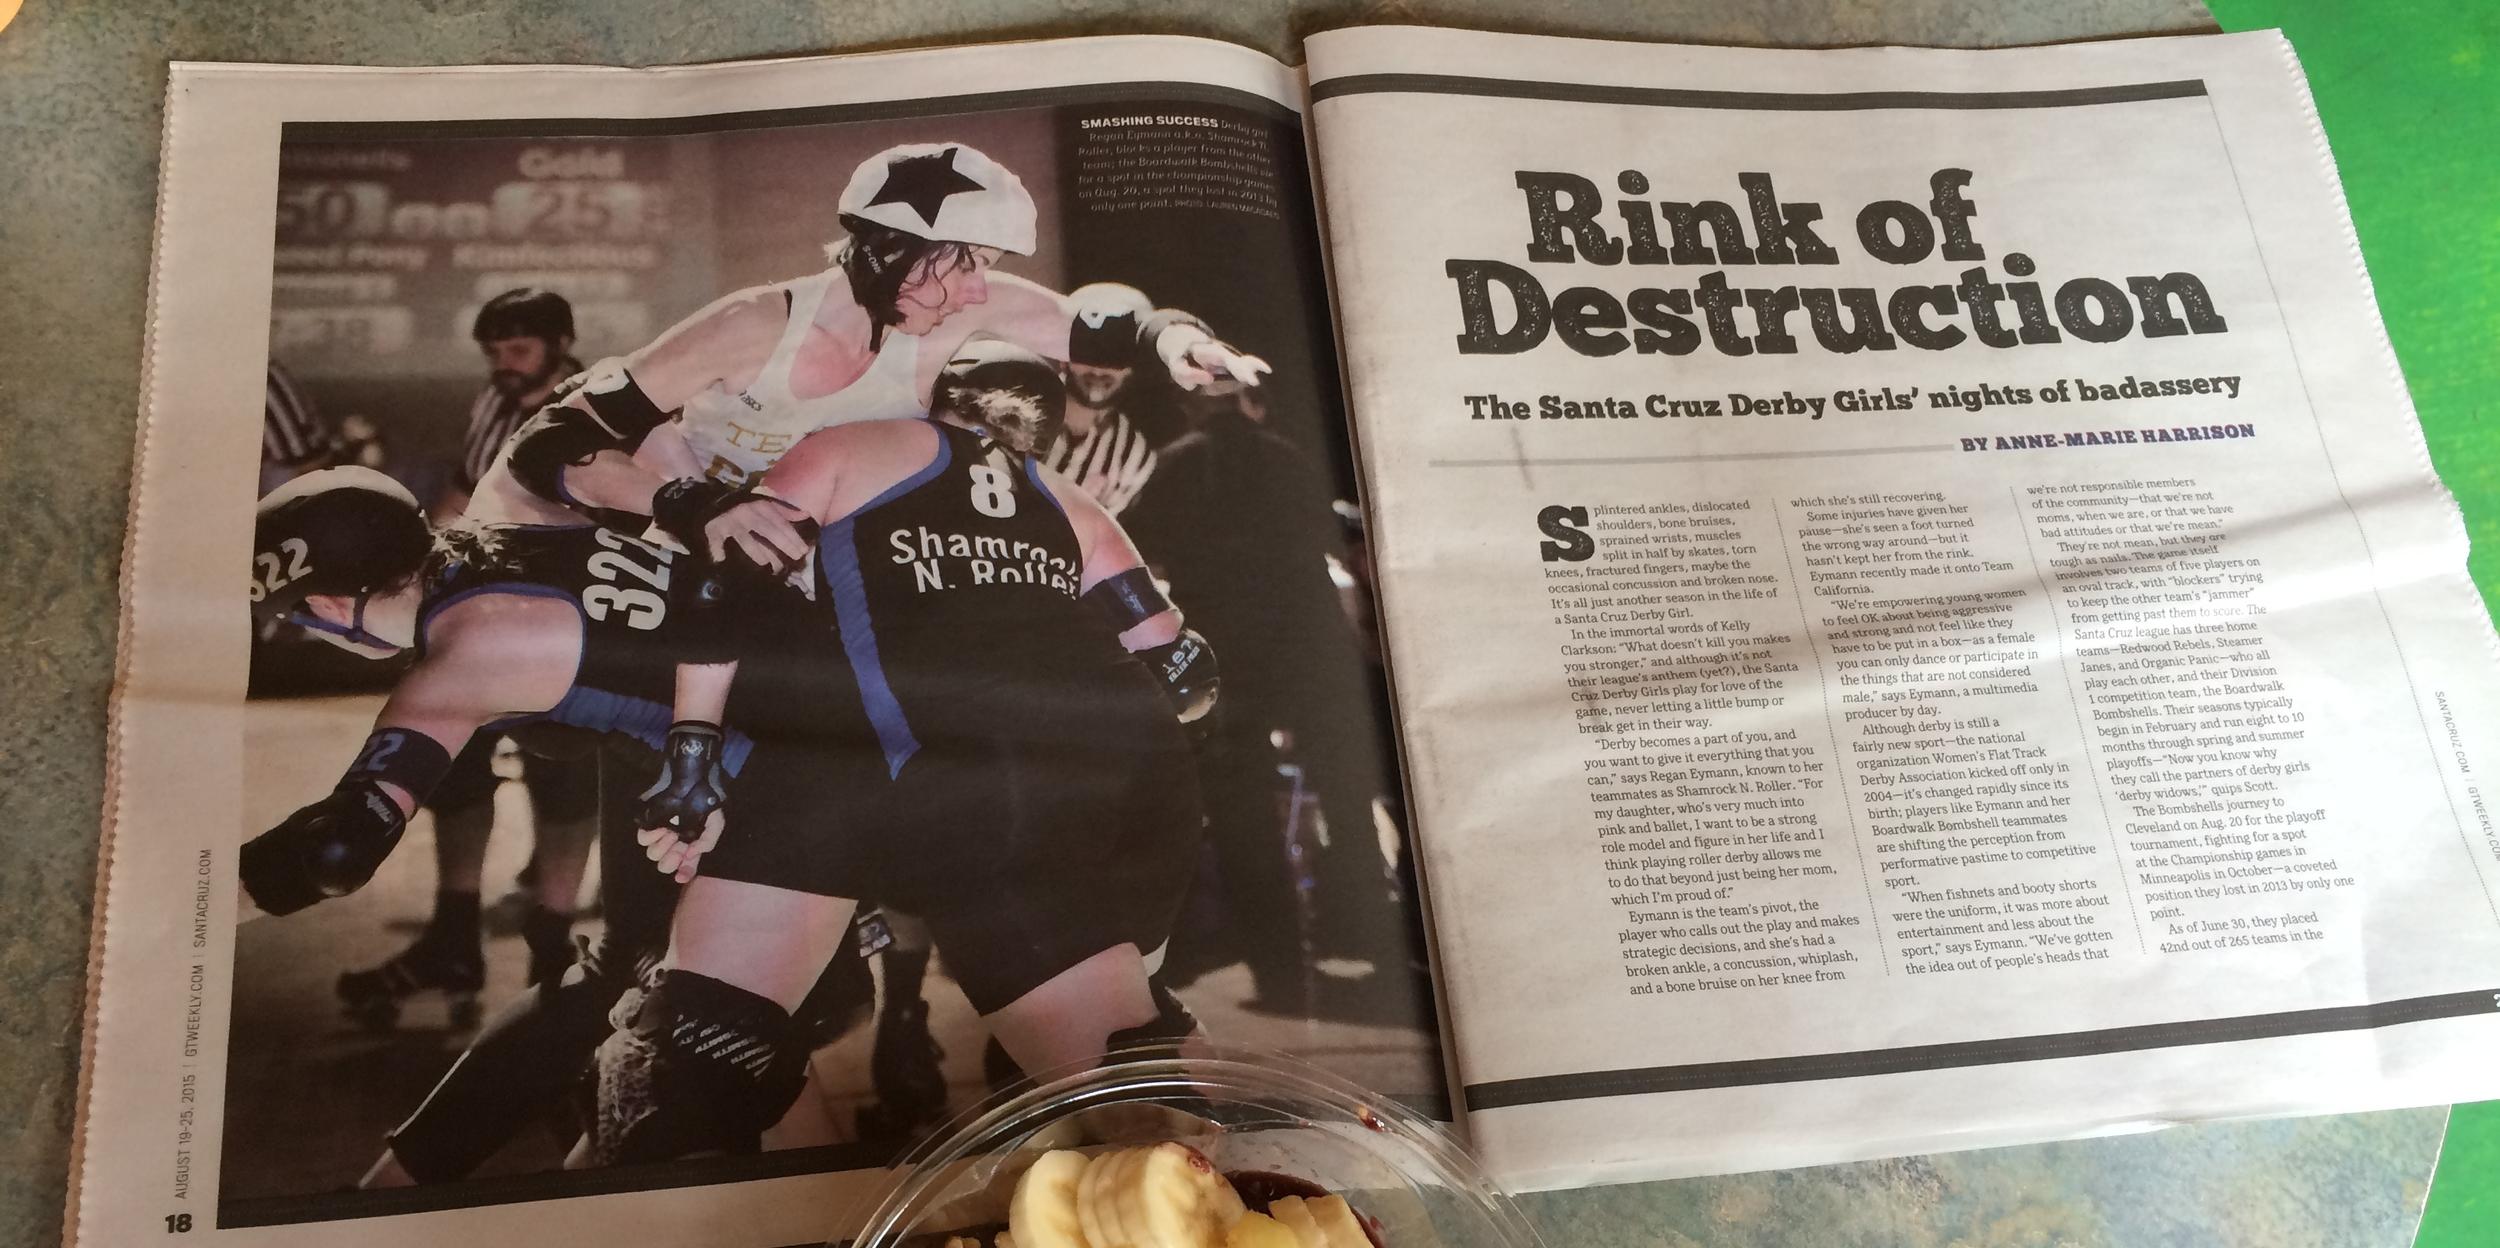 Santa Cruz Good Times: Rink of Destruction by Anne-Marie Harrison